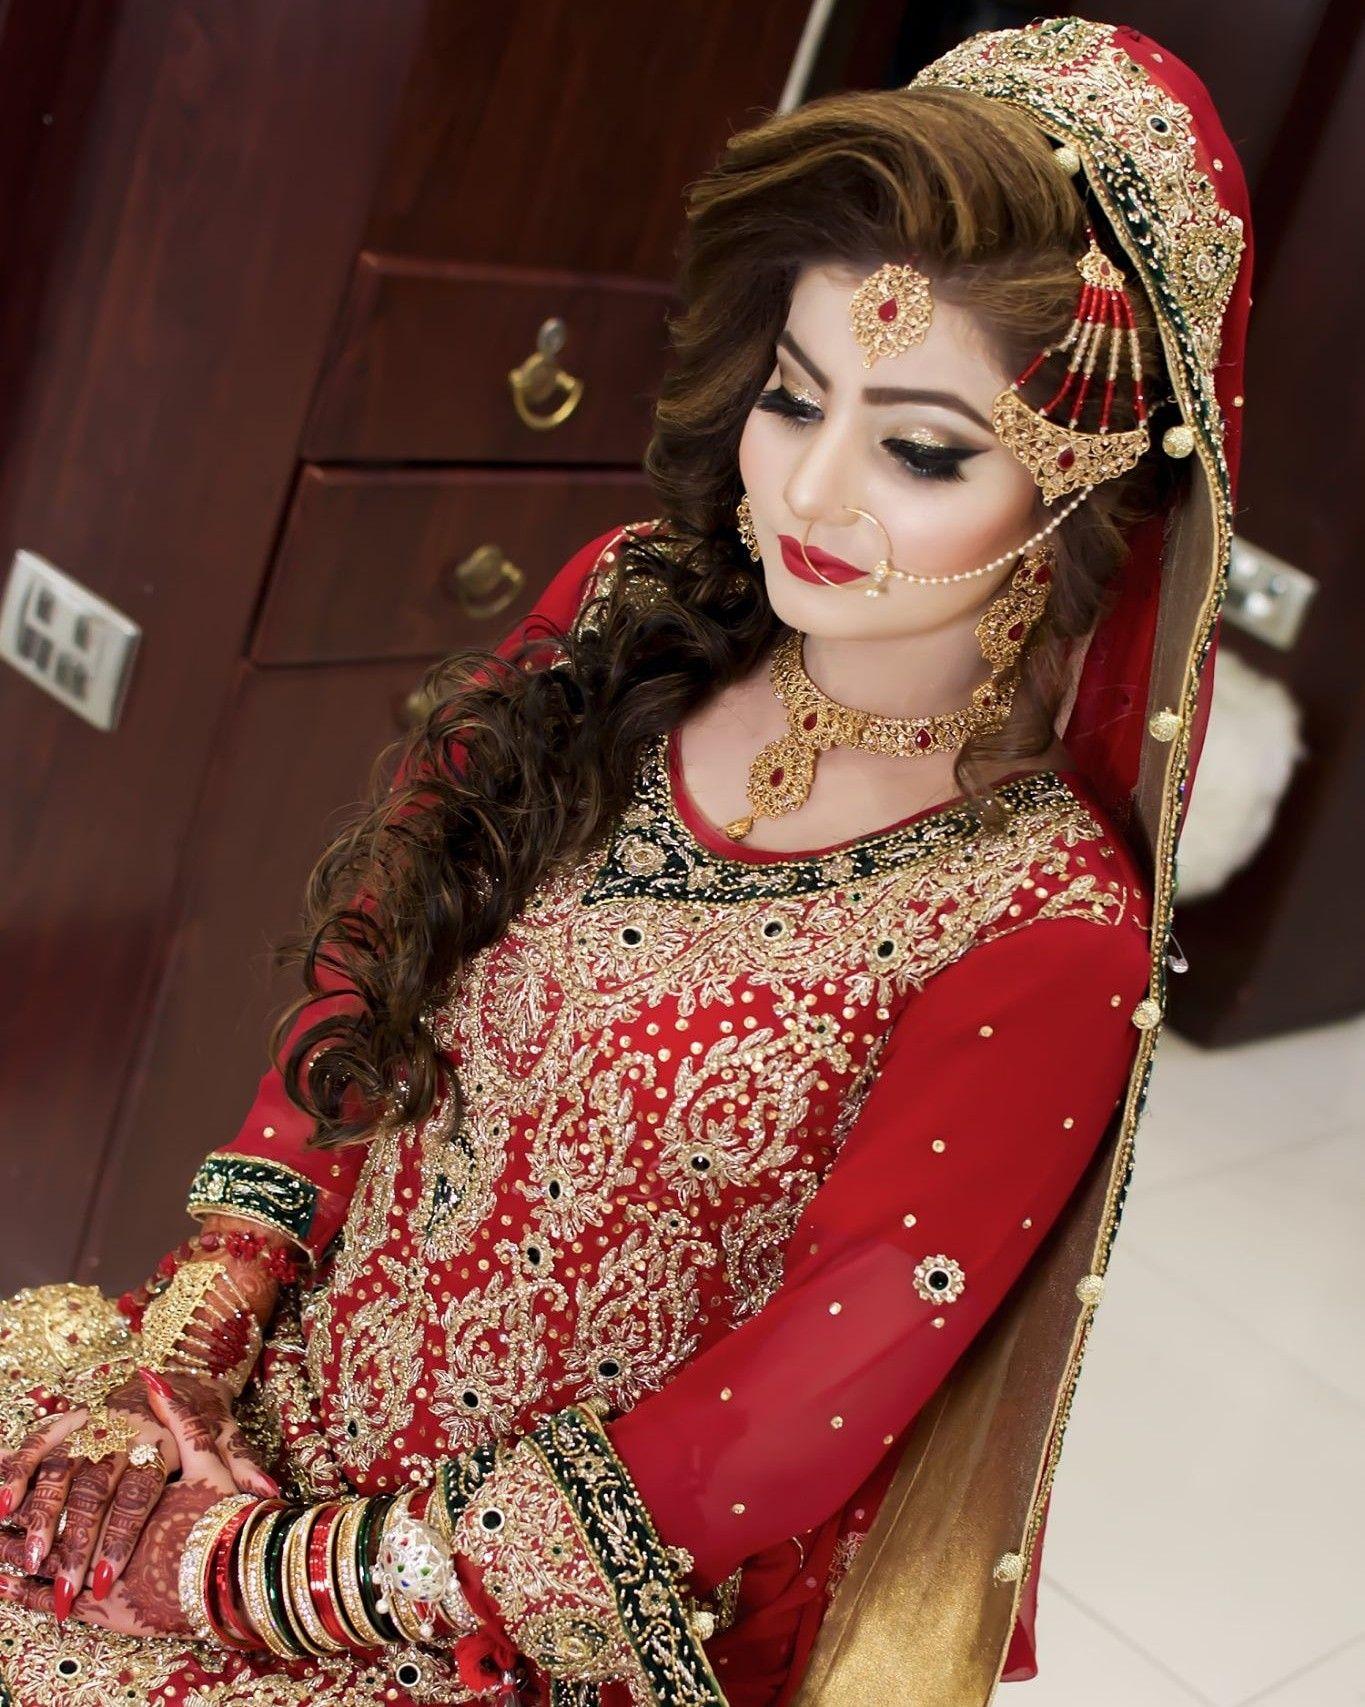 Bridal Makeup Pakistan Bride Beauty Parlor Bridal Makeup